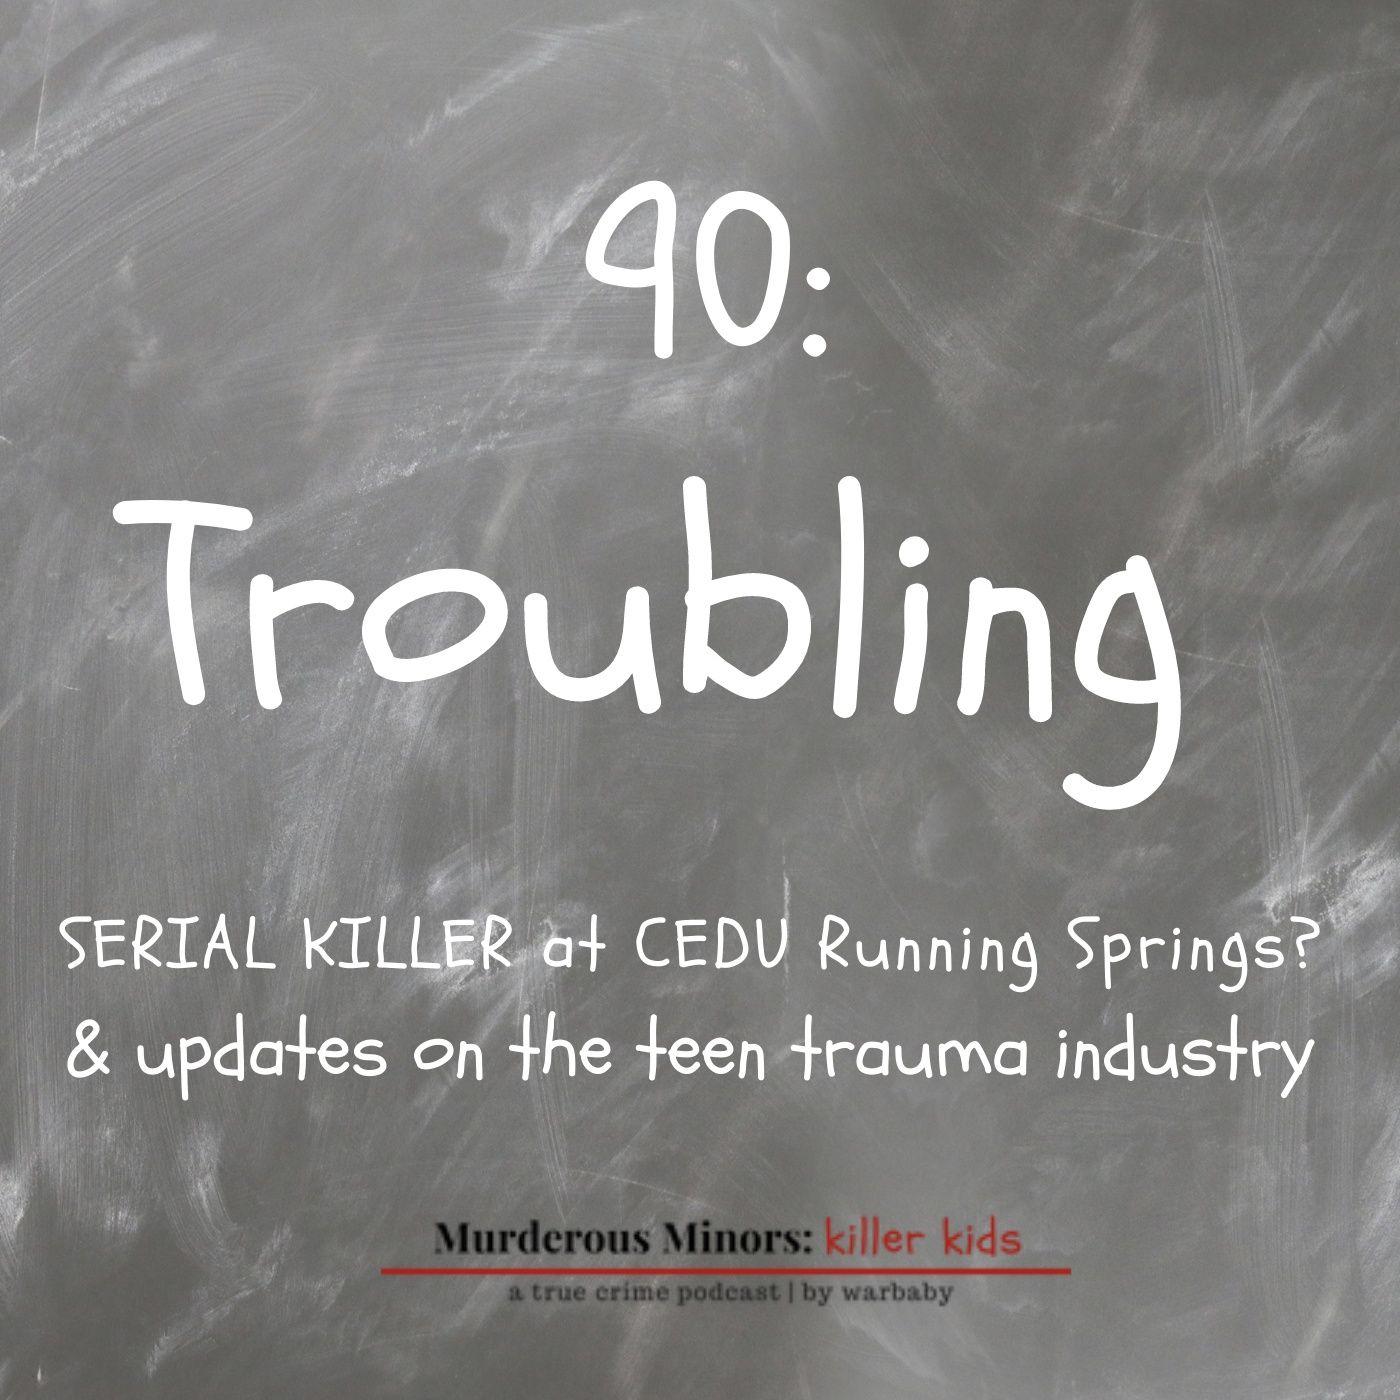 Troubling - Serial Killer at CEDU Running Springs?